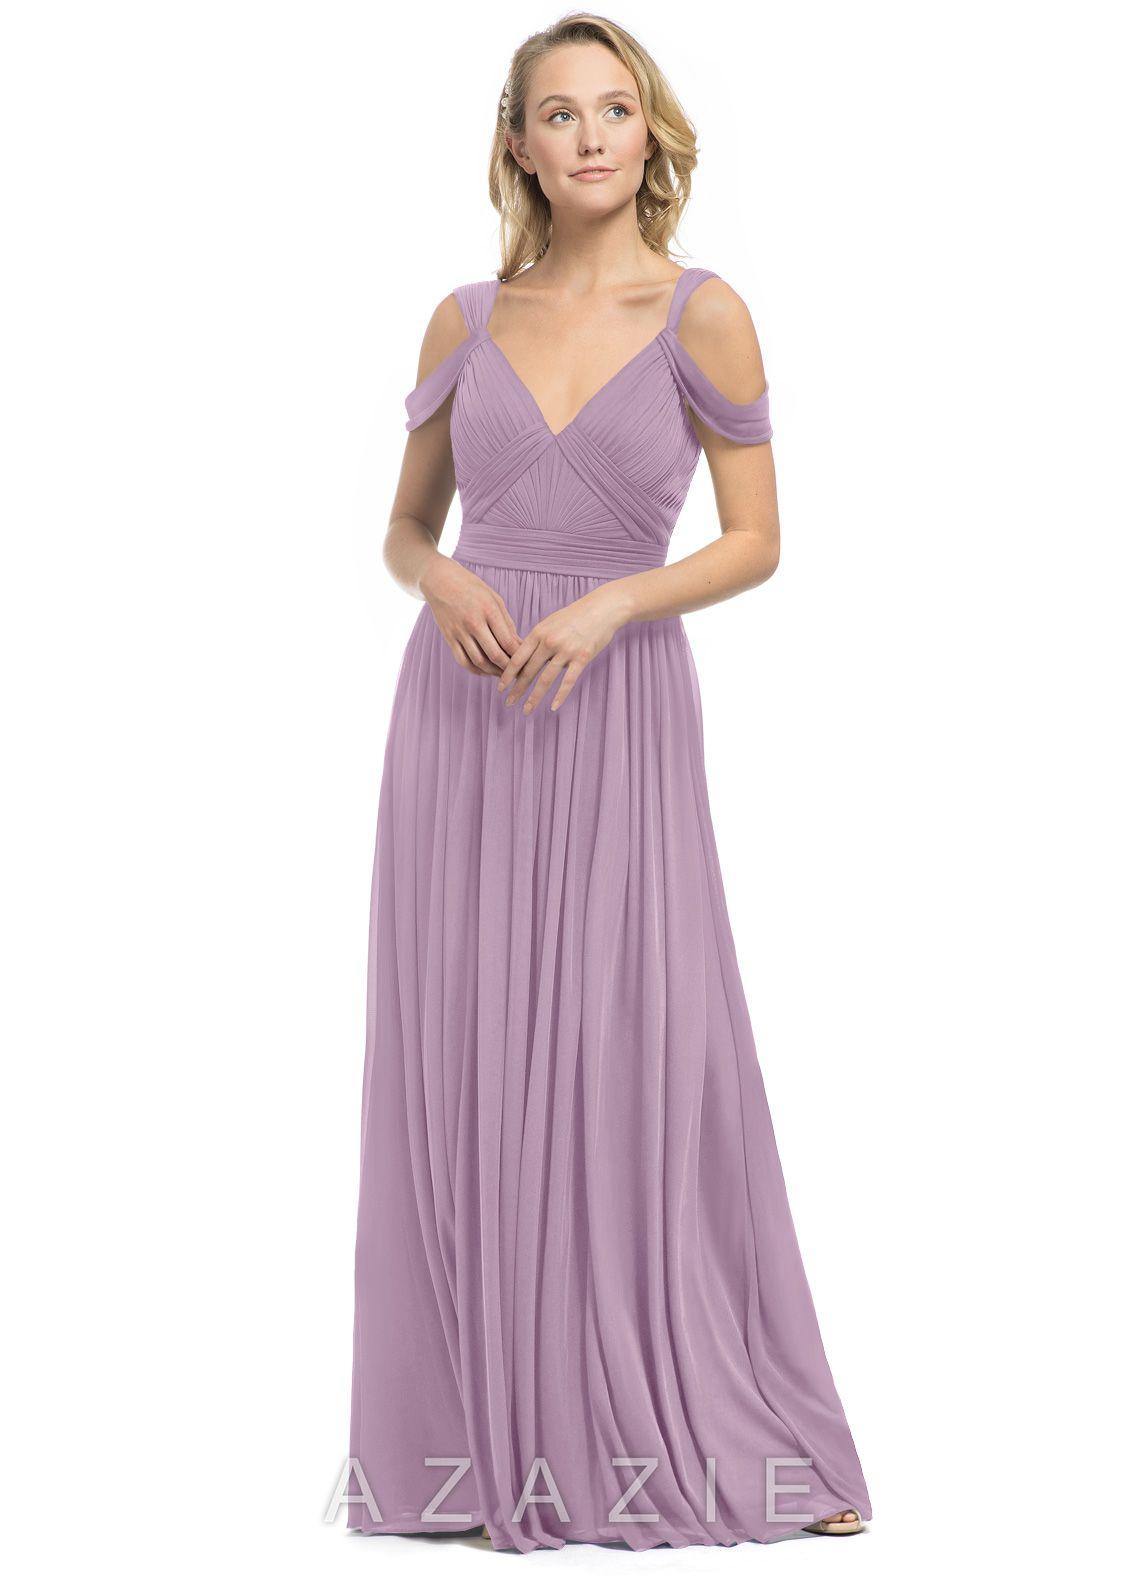 AZAZIE CALLA - Bridesmaid Dress